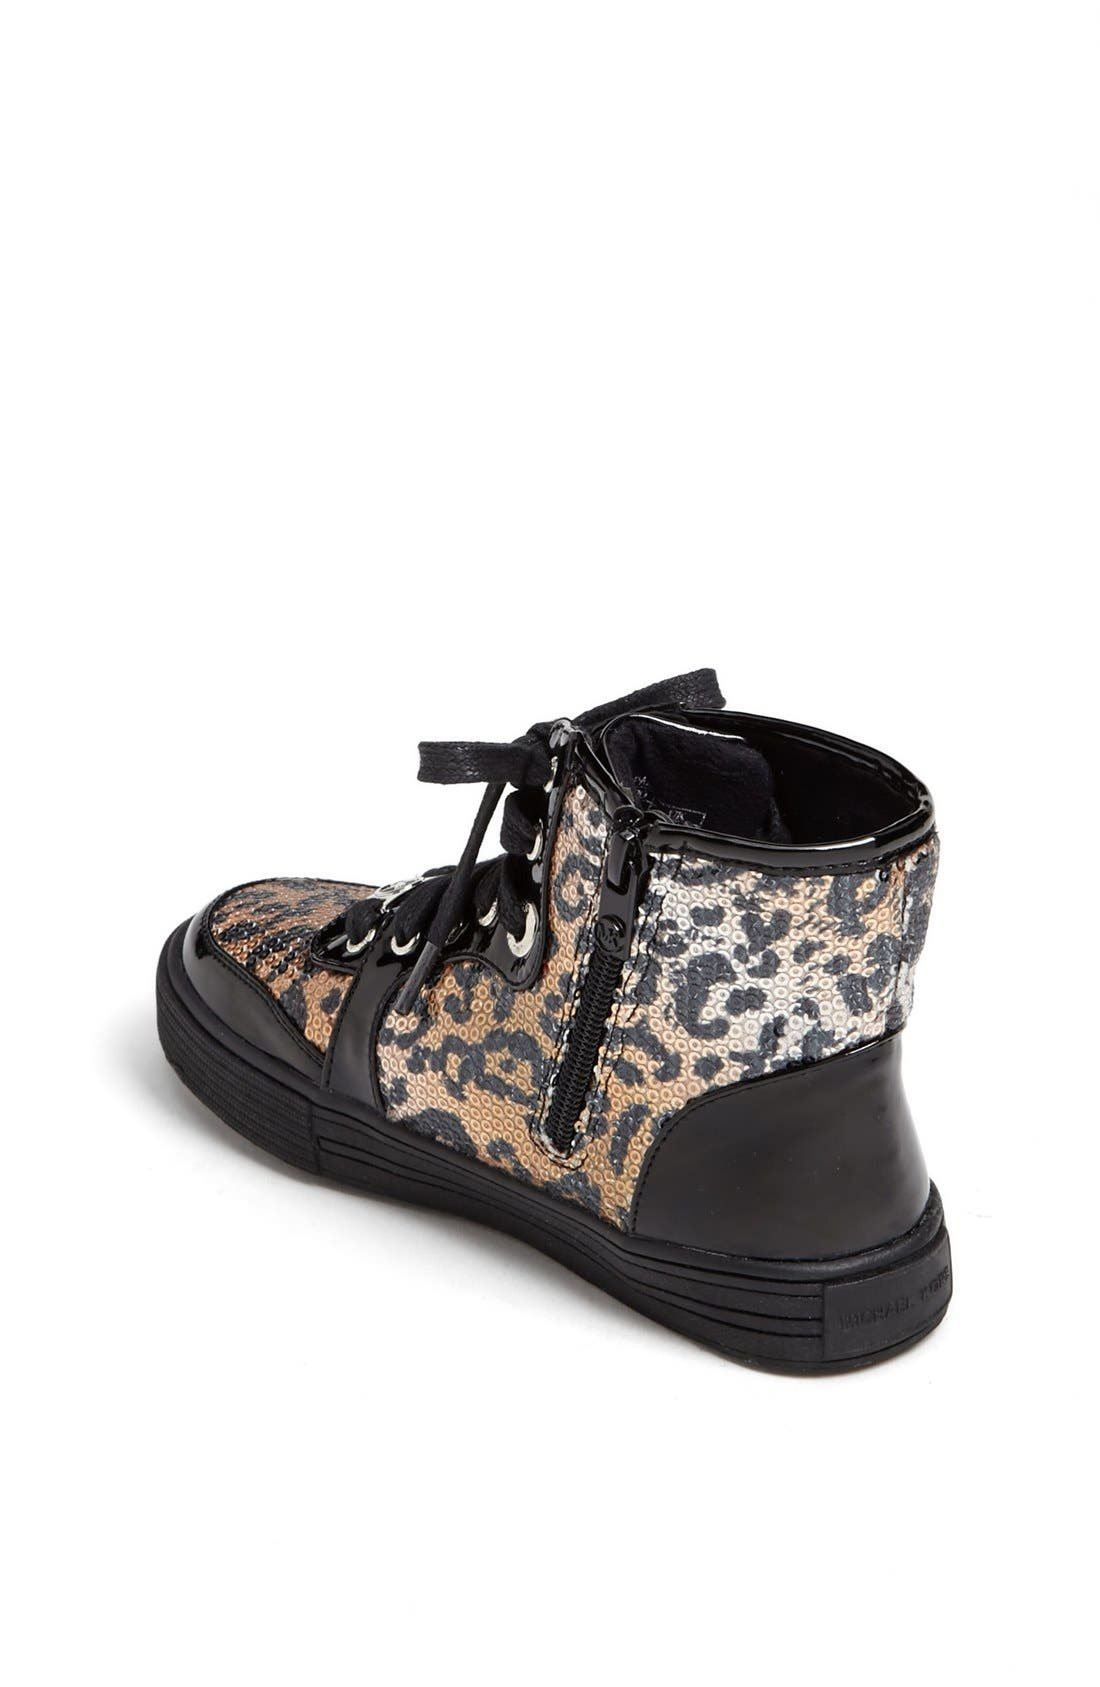 Alternate Image 2  - MICHAEL Michael Kors 'Ivy' High Top Sneaker (Walker, Toddler, Little Kid & Big Kid)